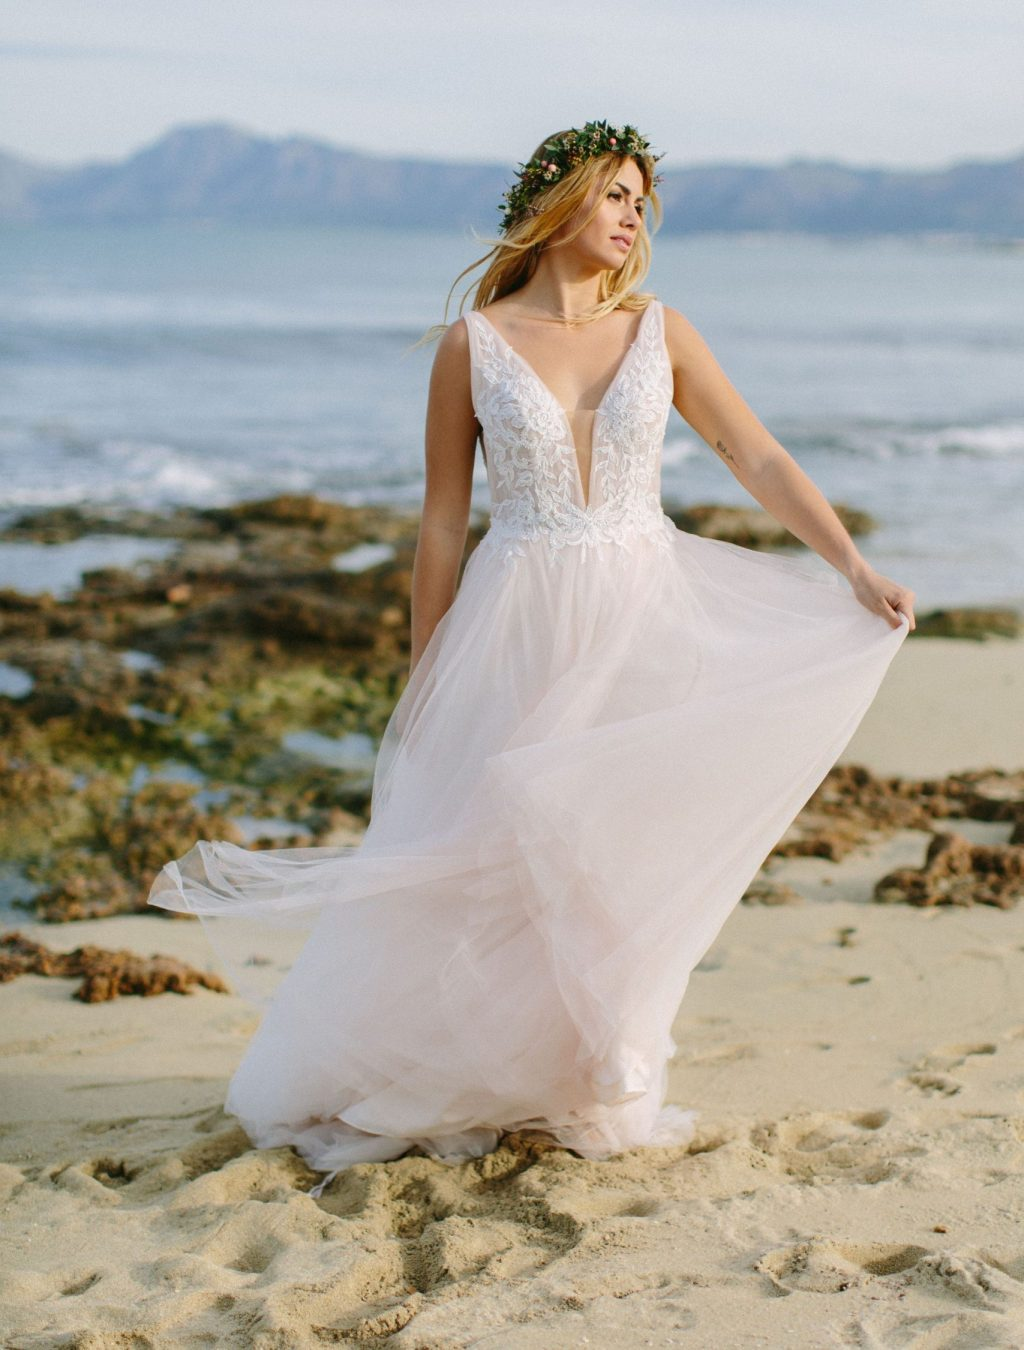 Ideas for dresses for wedding